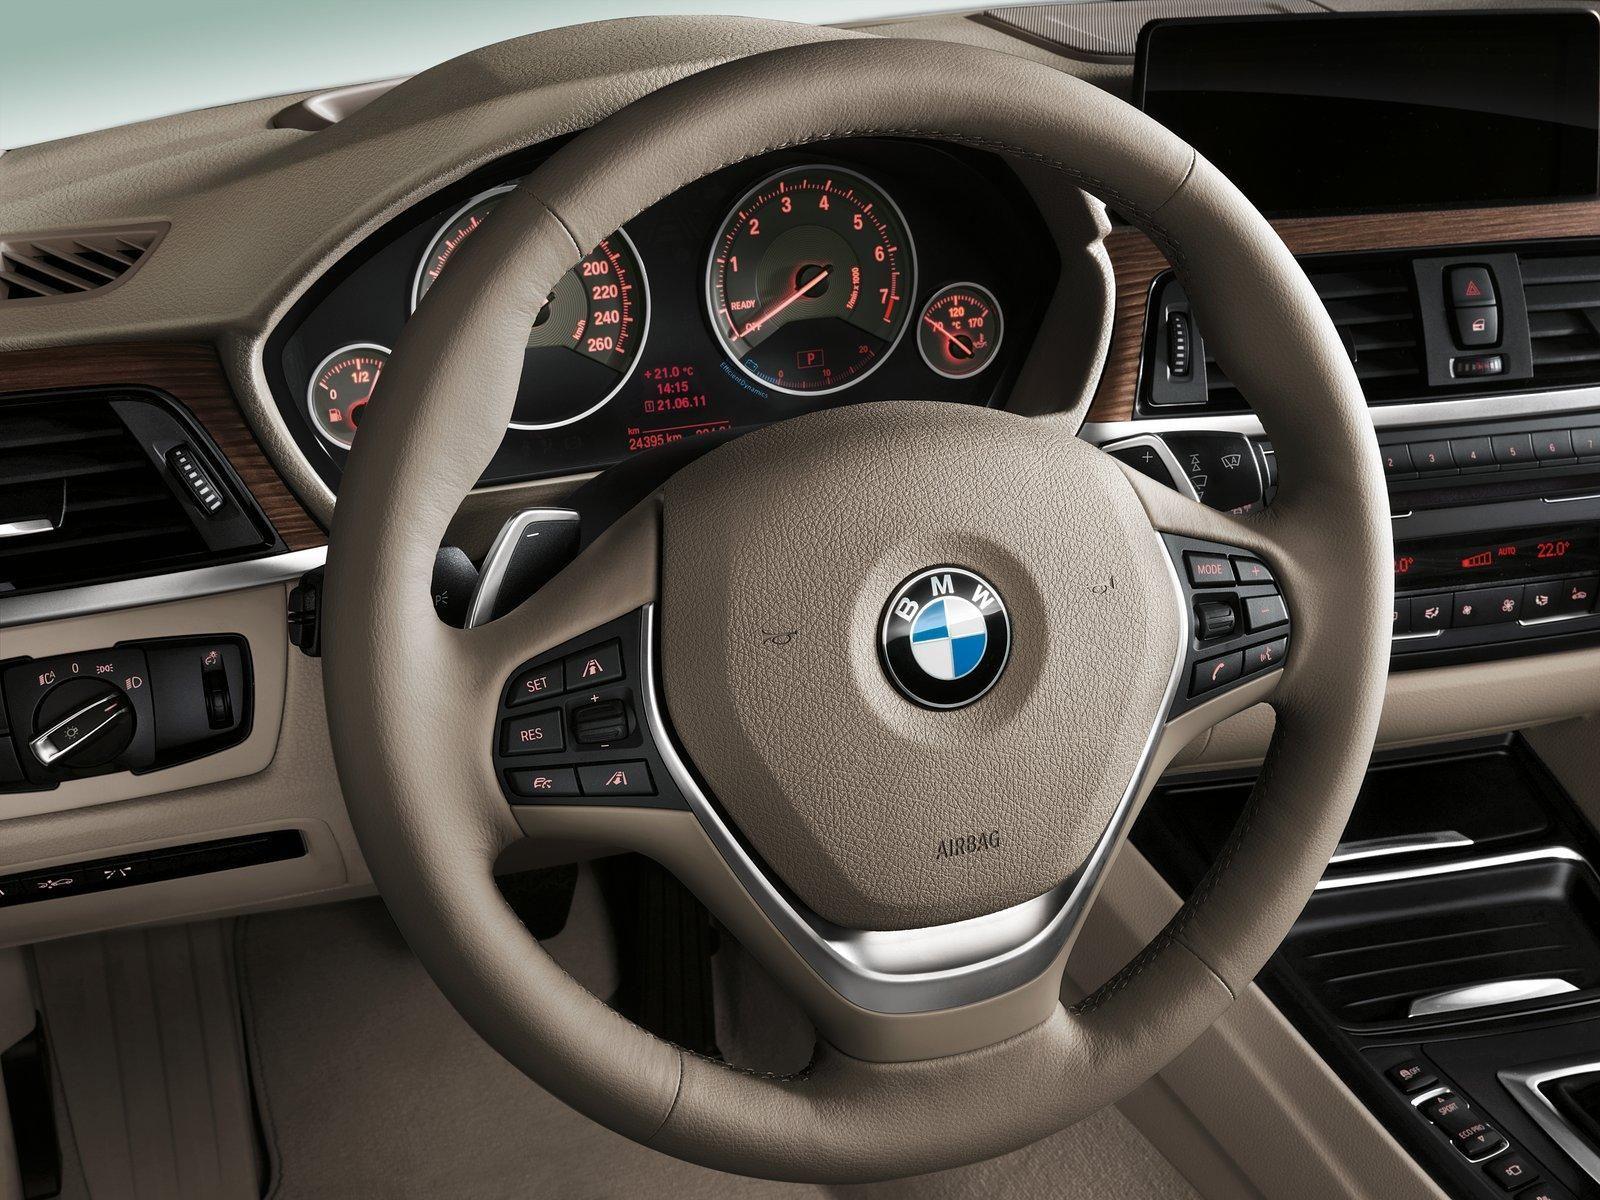 Bmw 3 Series Beige Leather Interior Car Steering Wheel Silver